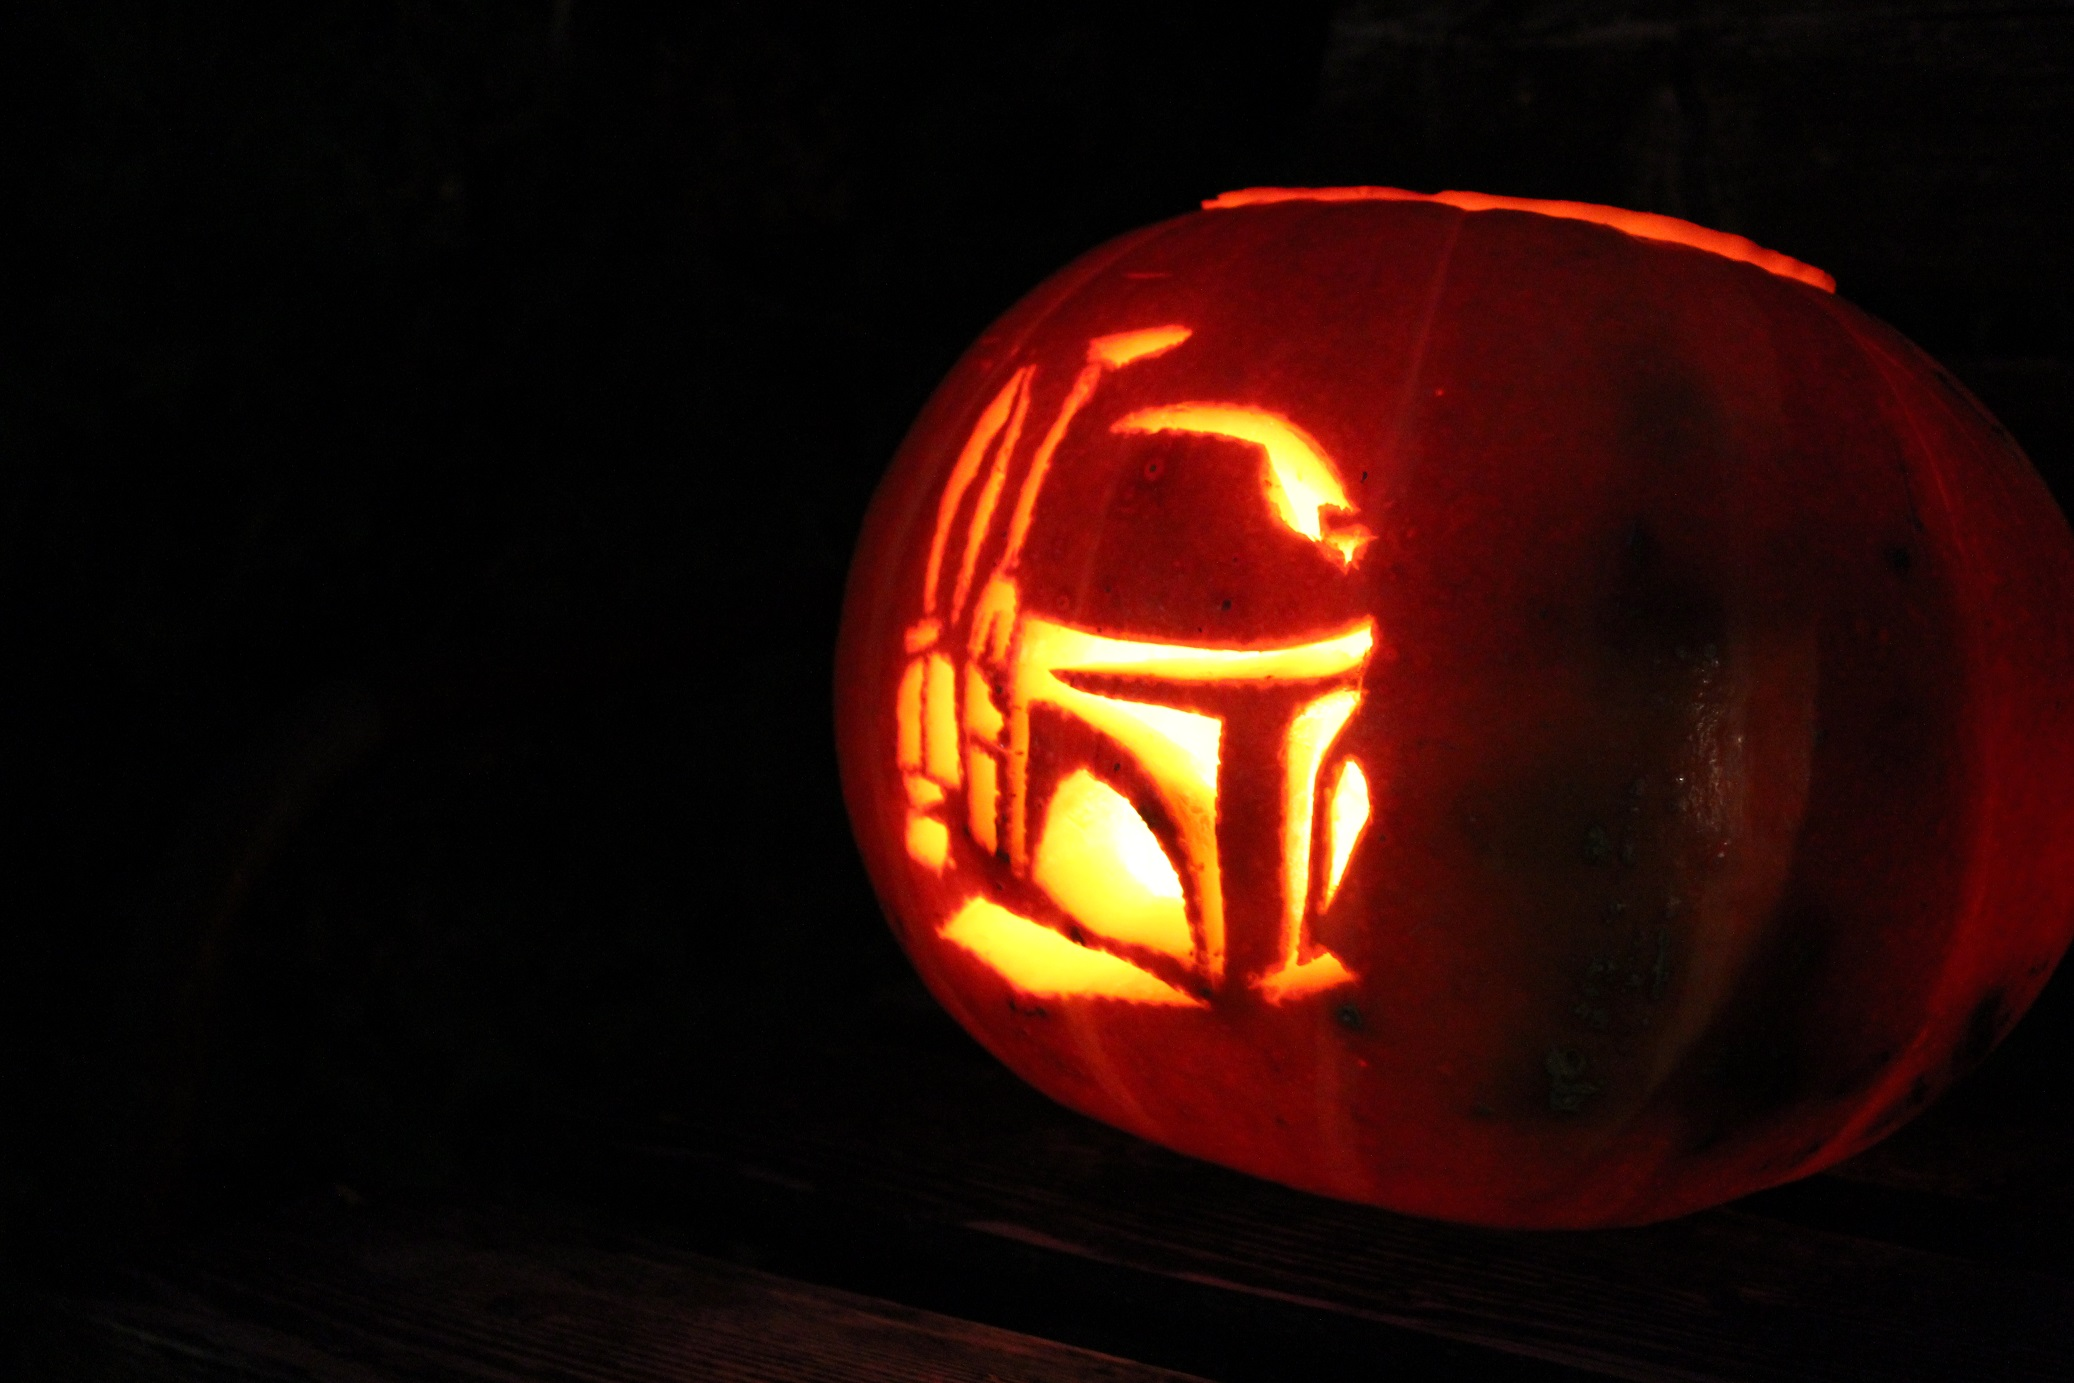 szmk_tok_pumpkin_boba_fett_star_wars_29.JPG